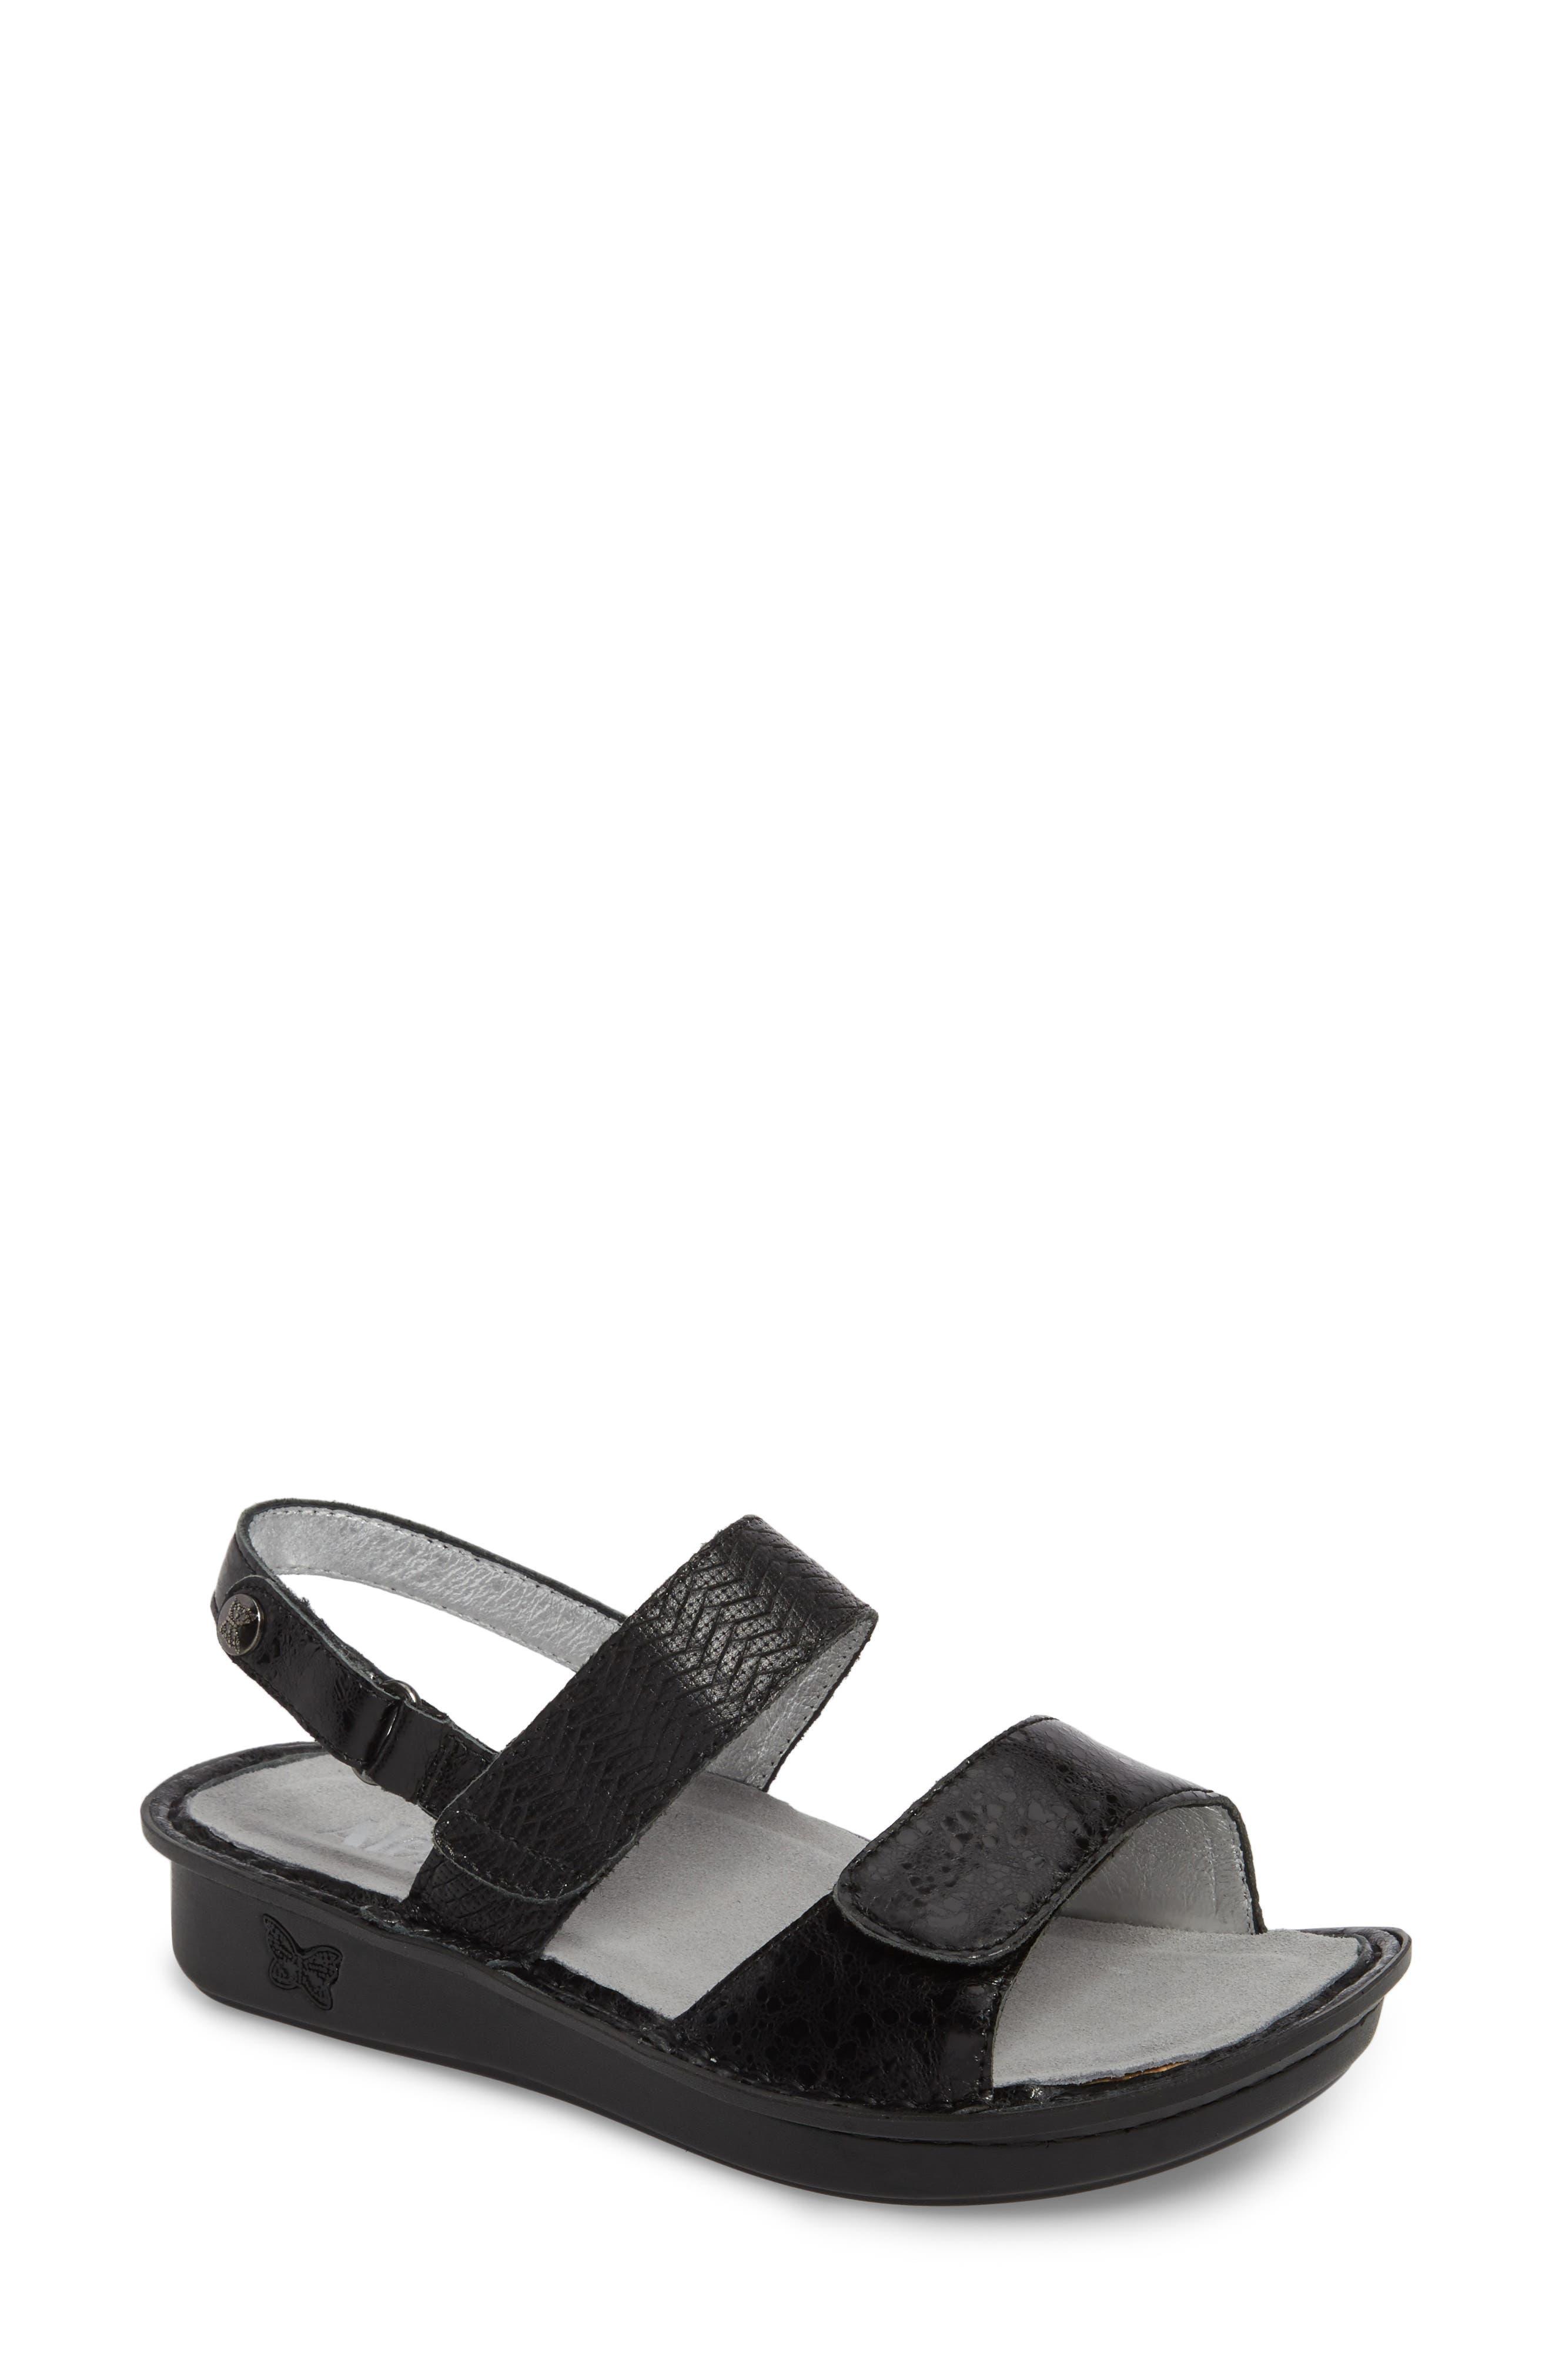 ALEGRIA, 'Verona' Sandal, Main thumbnail 1, color, BRAIDED BLACK LEATHER